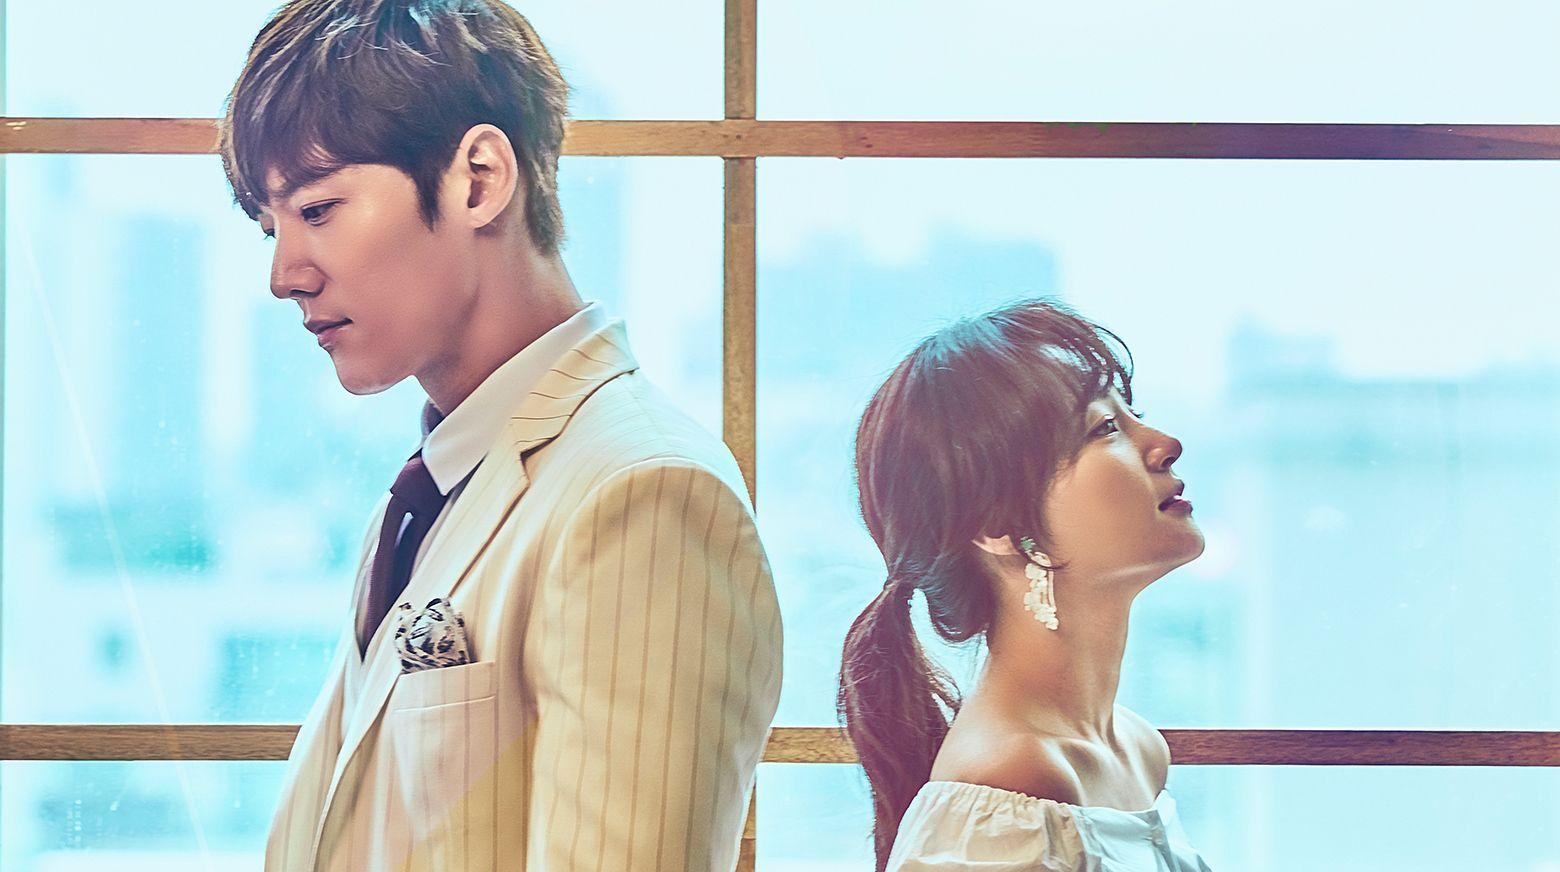 Download Devilish Joy Korean Drama Engsub In 2020 Korean Drama Drama Korean